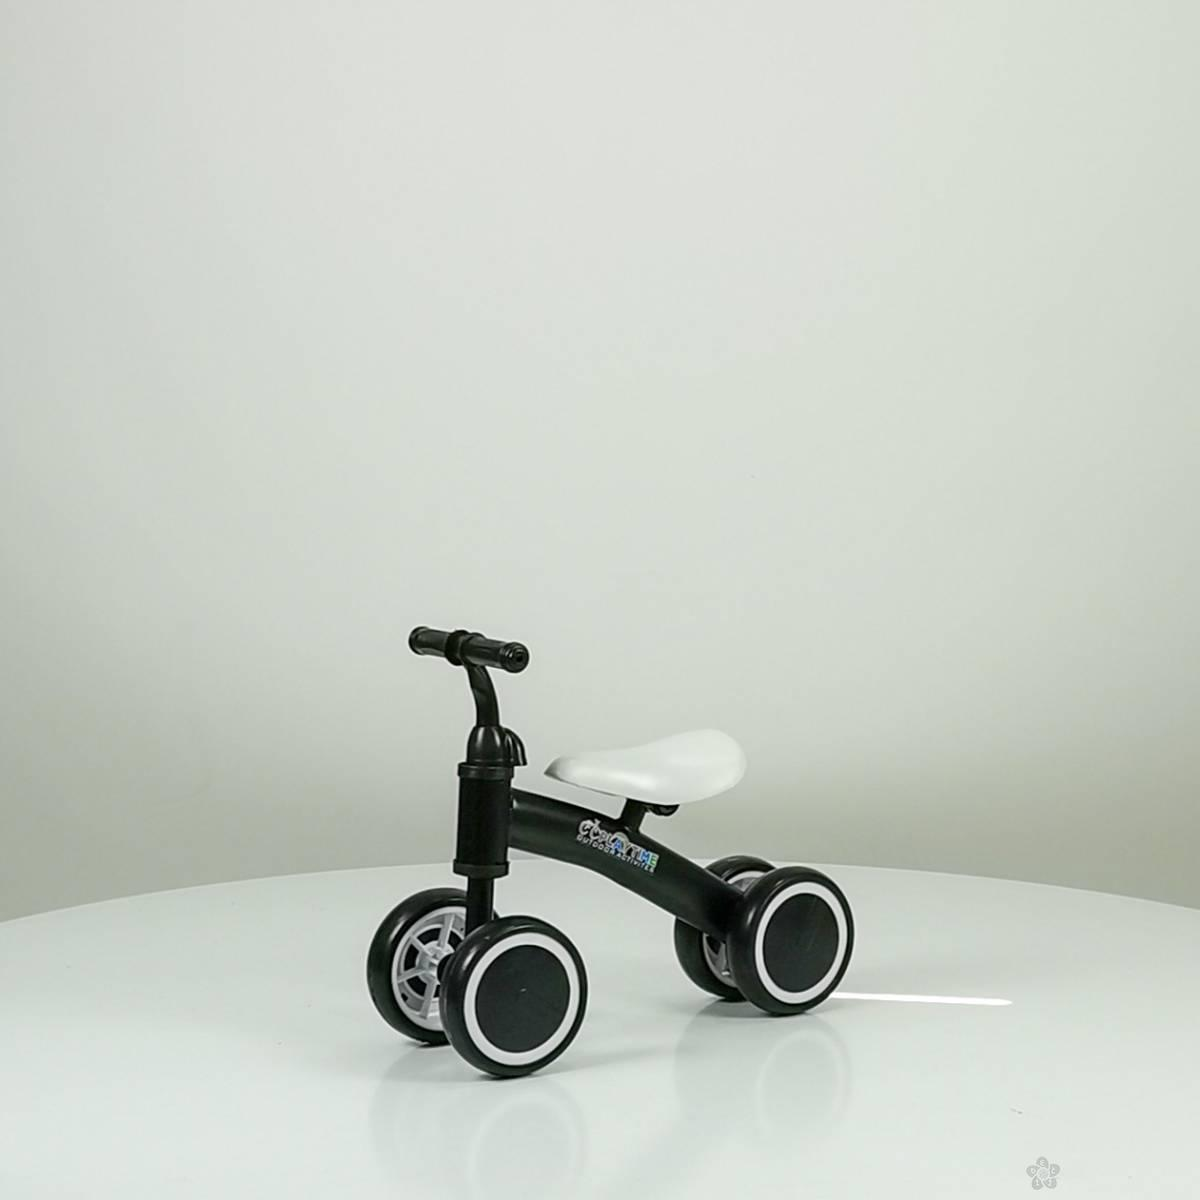 Balans bicikl baby model 753-1 CRNI